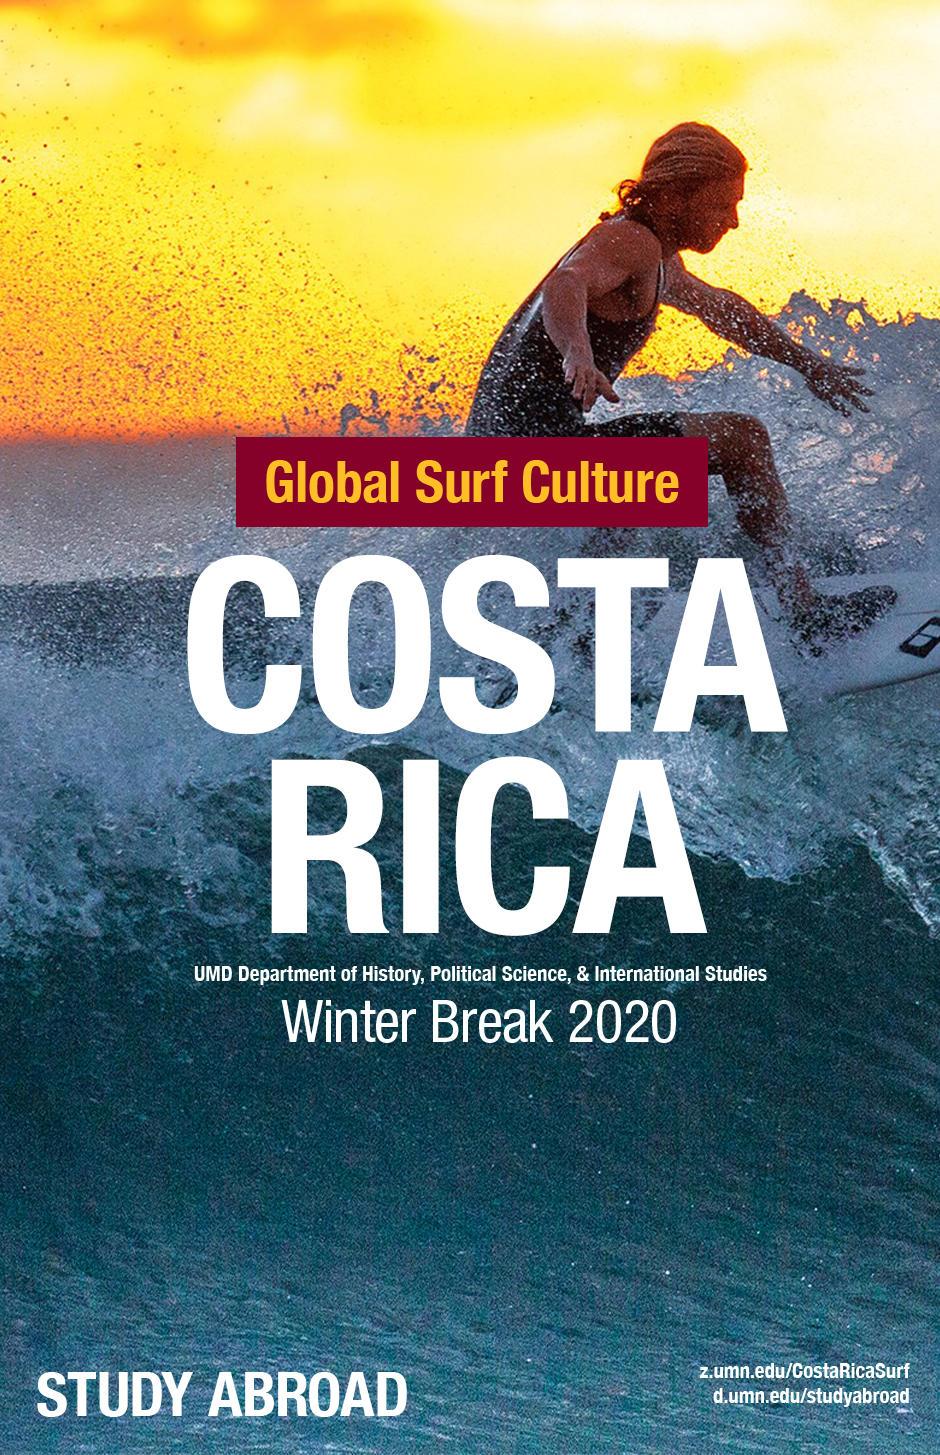 Costa Rica poster (2020)